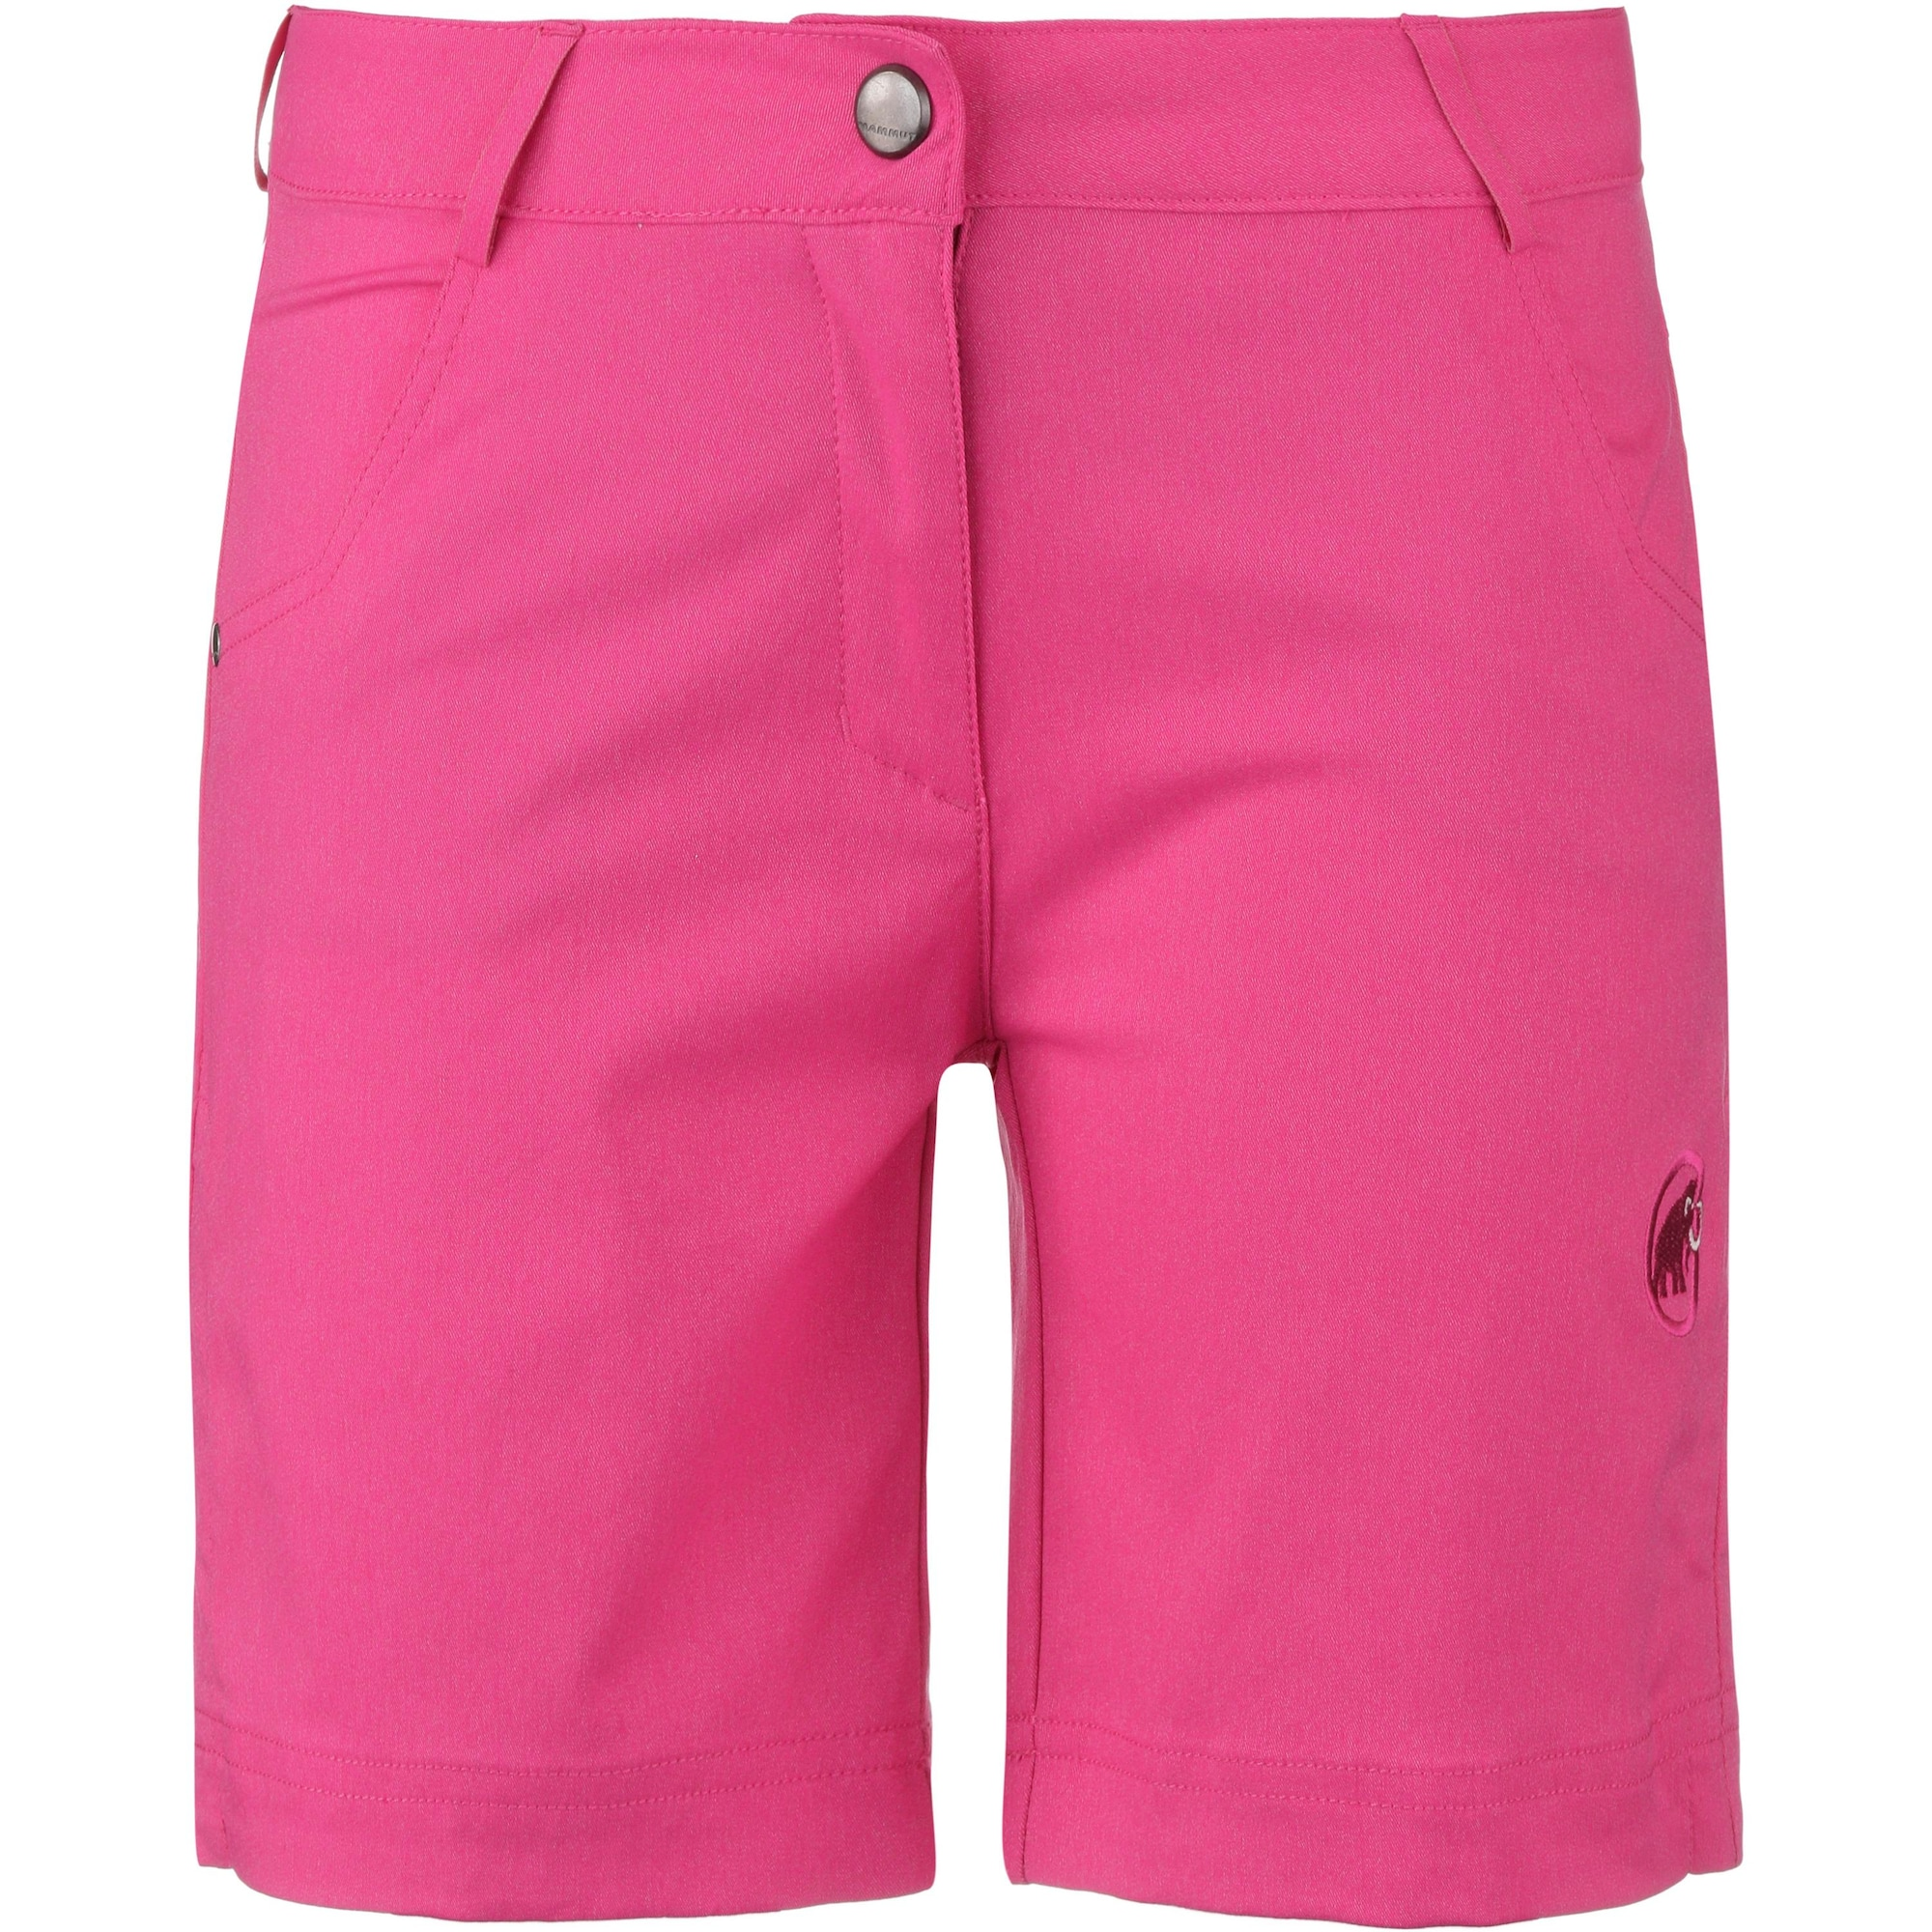 Kletterhose 'Massone' | Sportbekleidung > Sporthosen > Sonstige Sporthosen | Pink | mammut